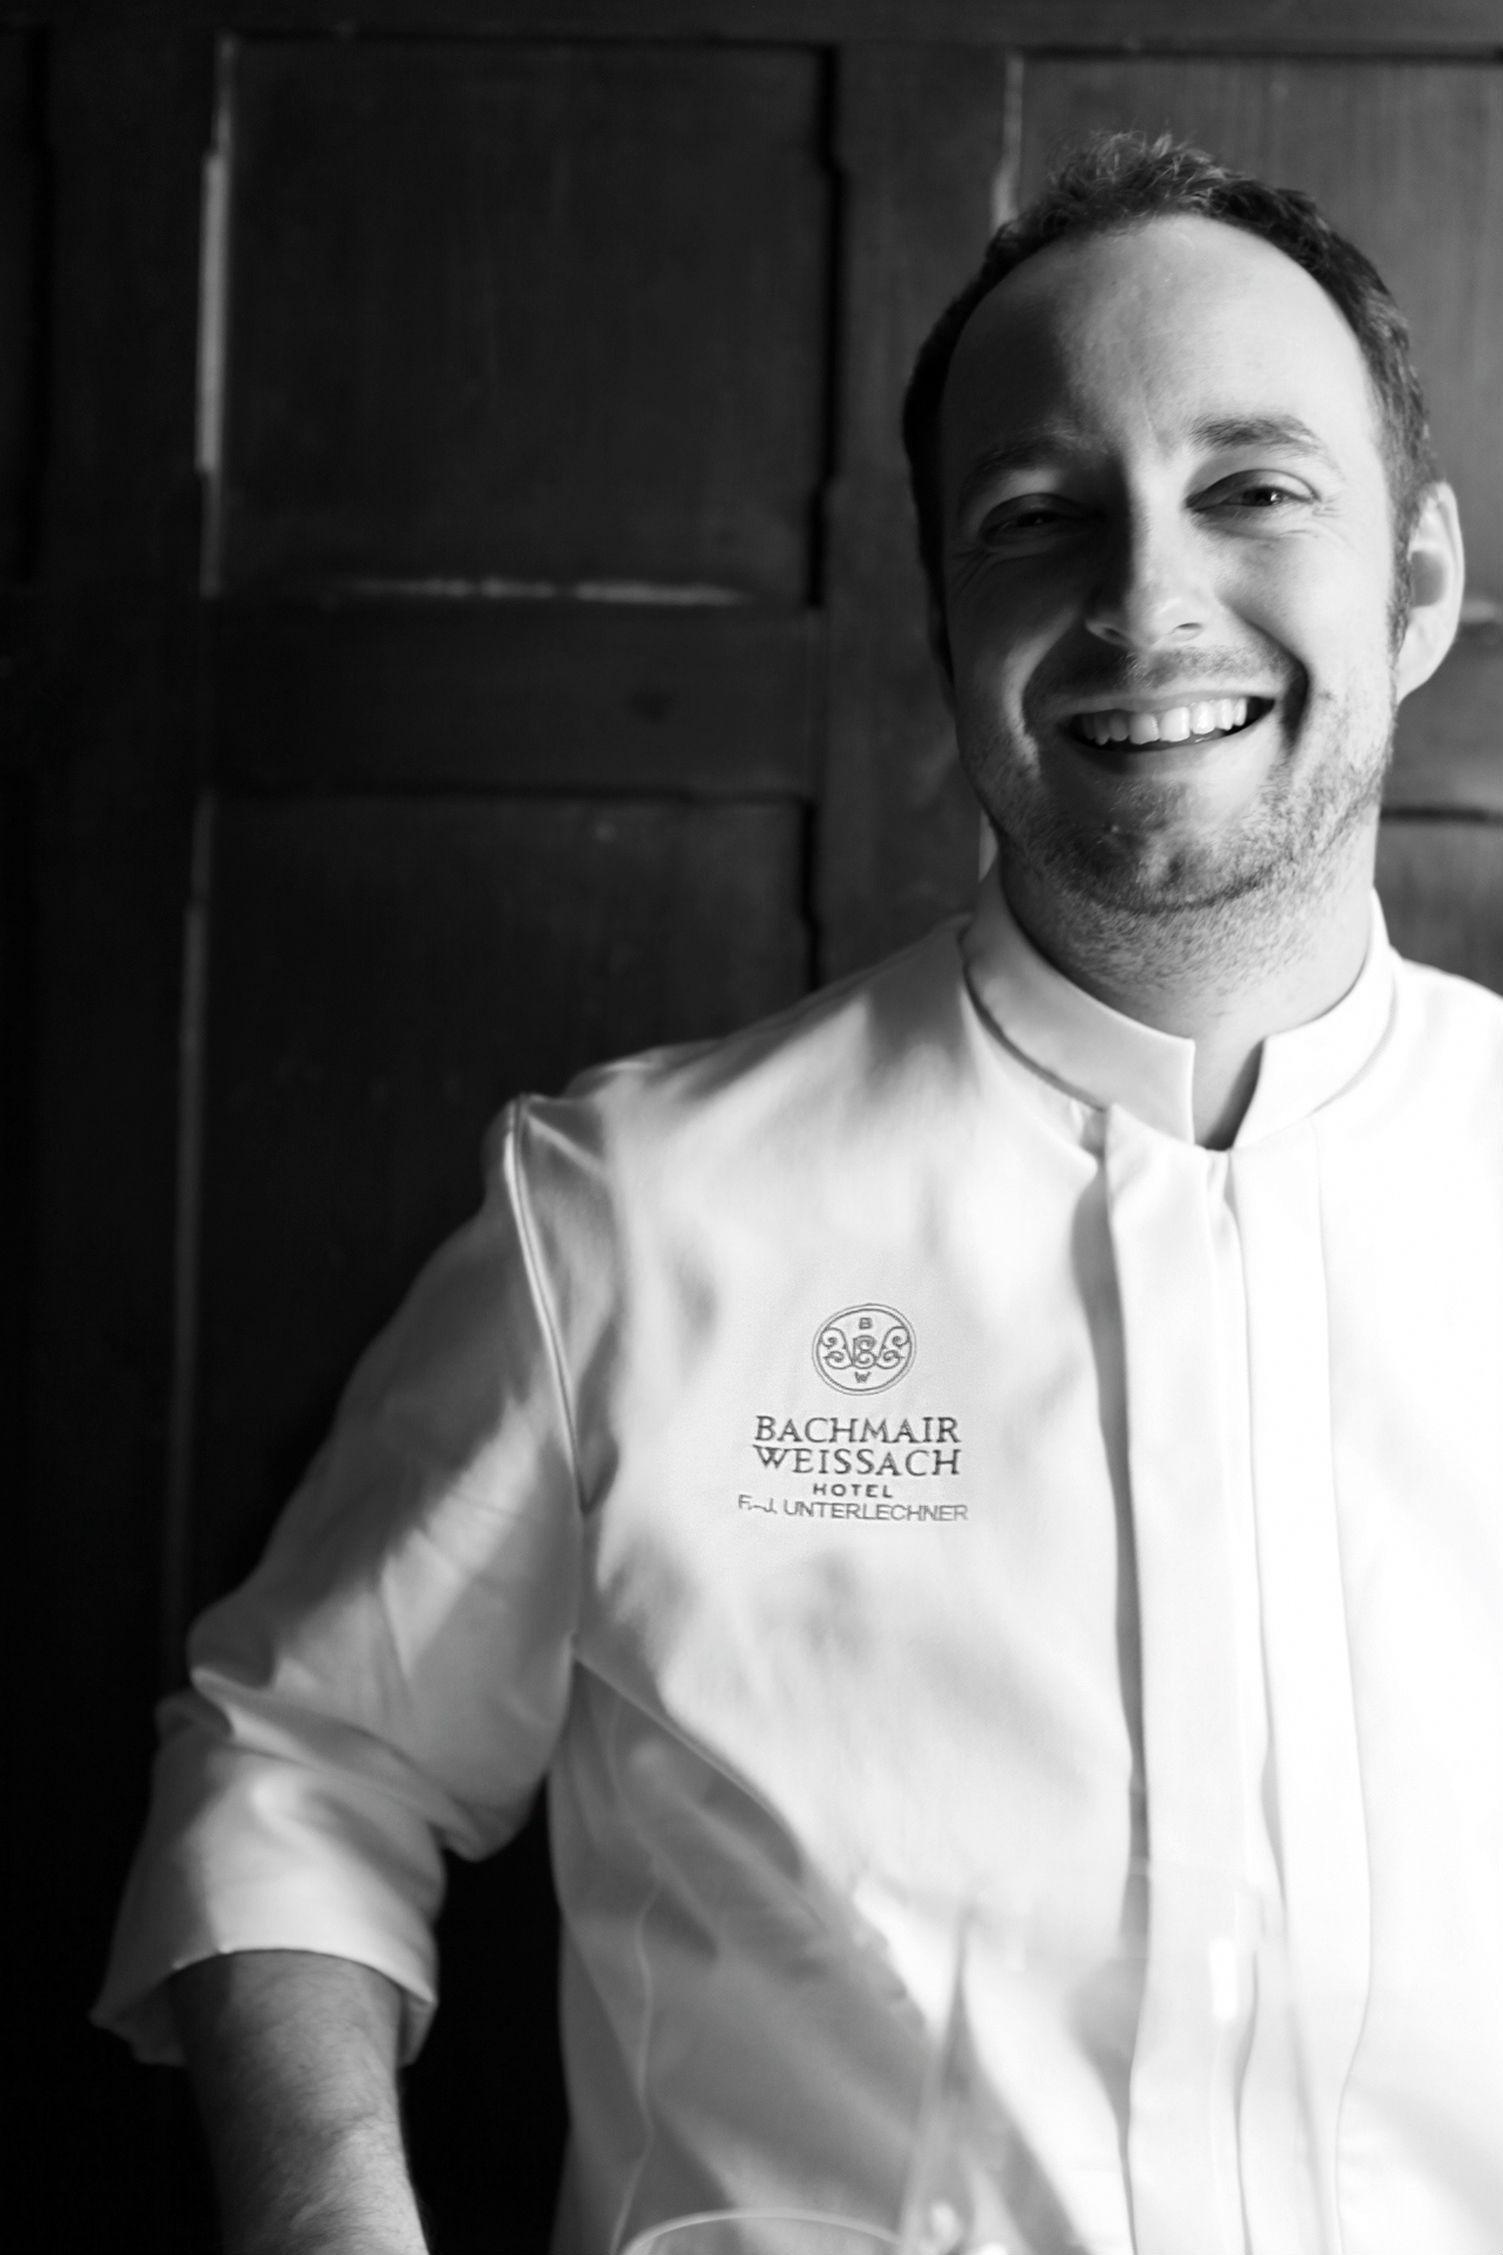 Tegernseer Küchendirektor triumphiert in SAT.1 Koch-Show